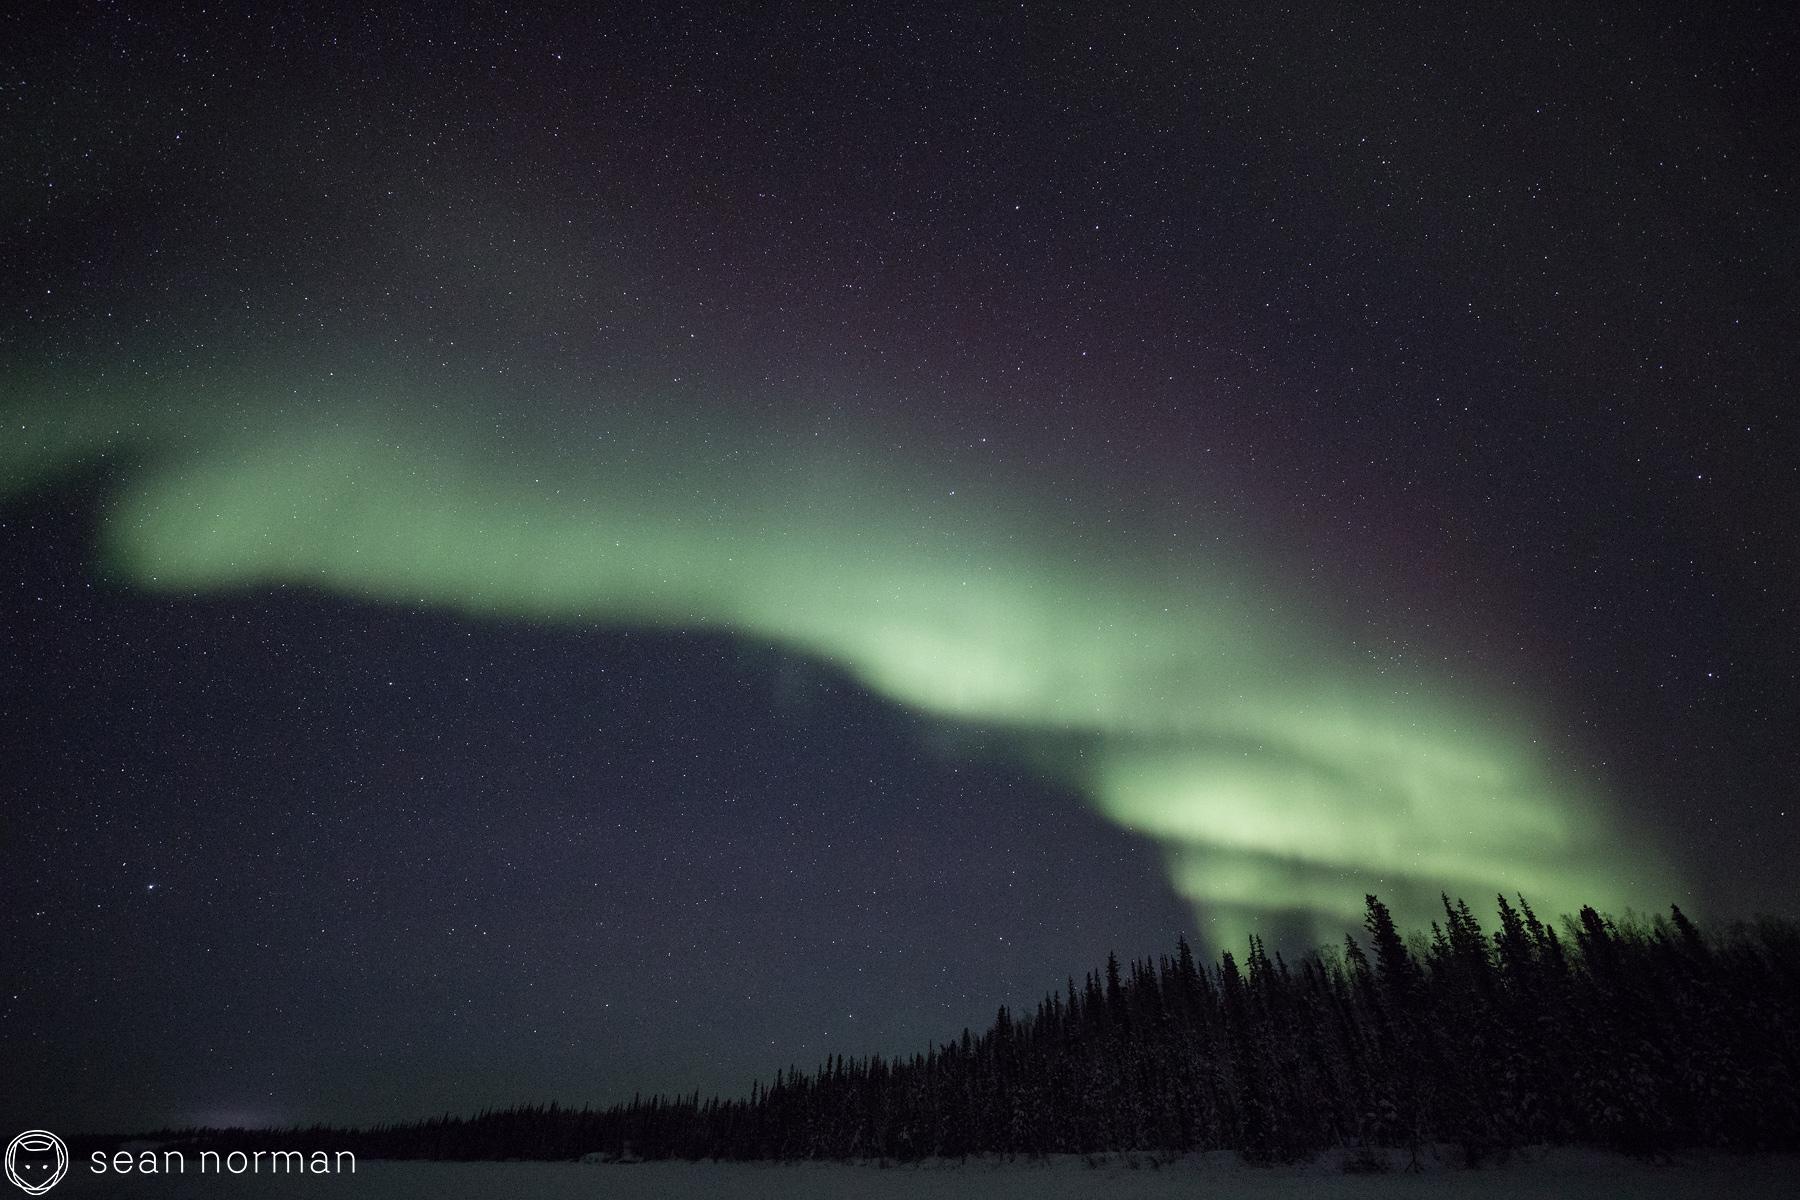 Sean Norman Yellowknife Aurora Chaser - Northern Light Photography - 4.jpg